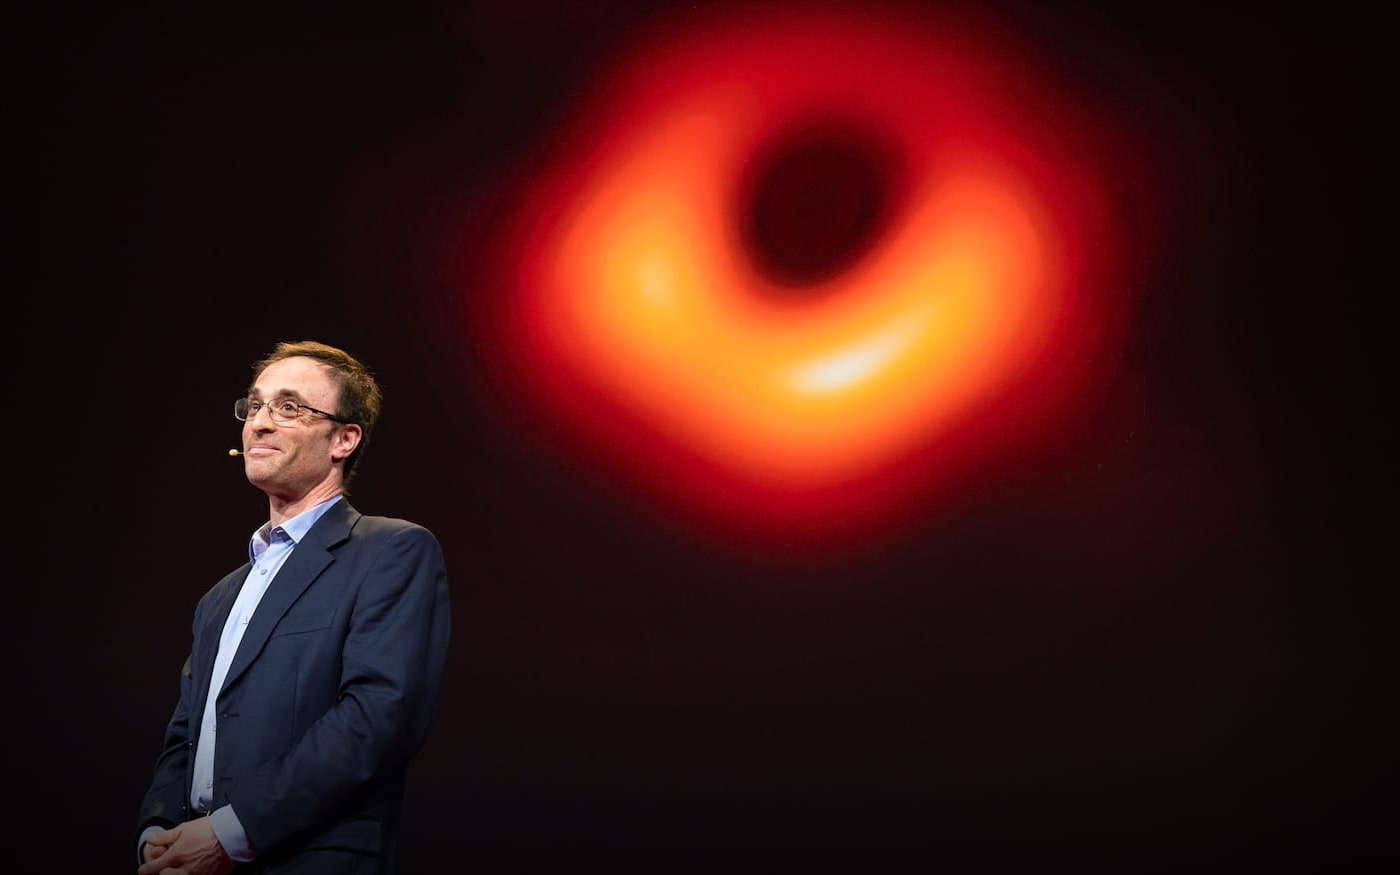 Cientistas que fotografaram buraco negro levam prêmio Breakthrough de US$ 3 milhões